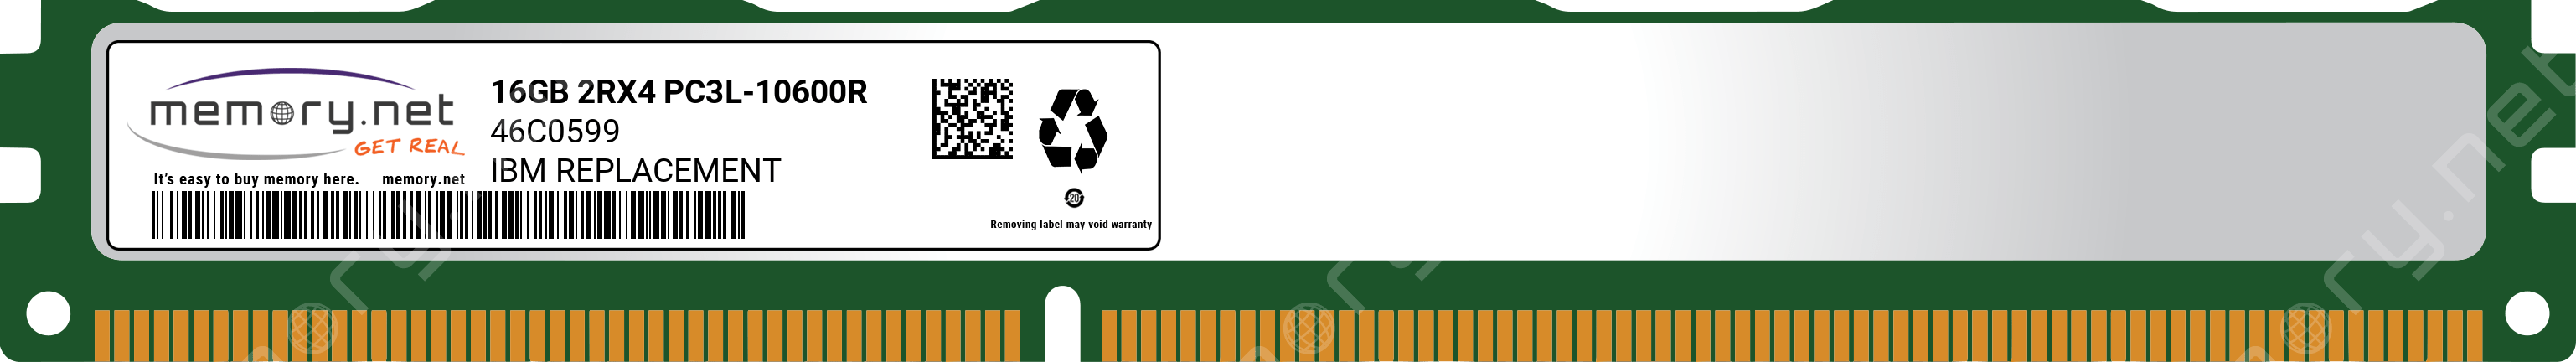 46C0599